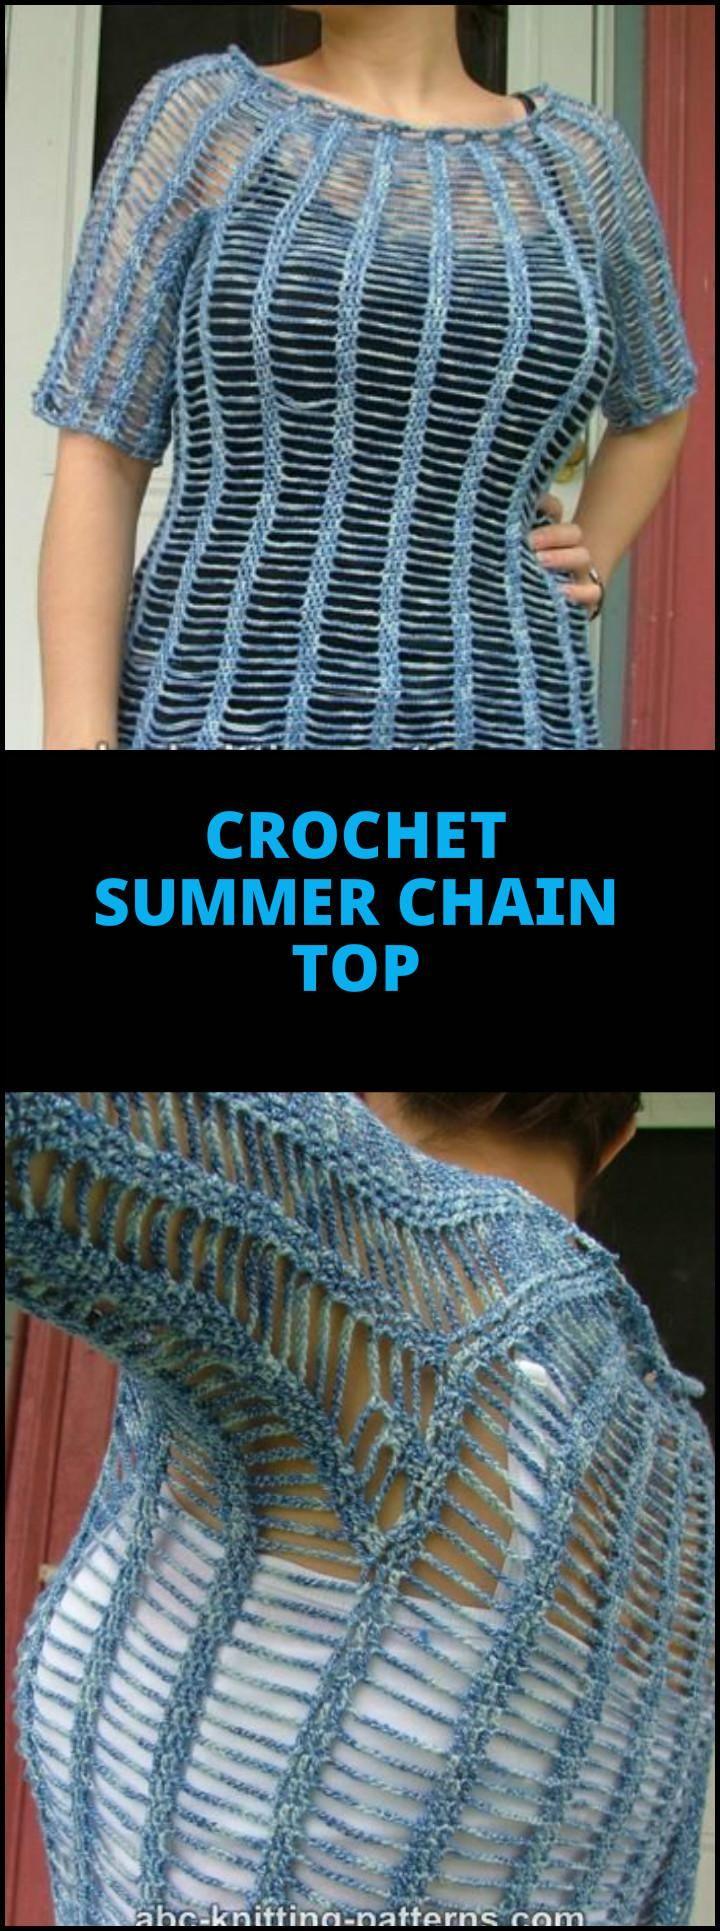 50+ Quick & Easy Crochet Summer Tops - Free Patterns | Pinterest ...